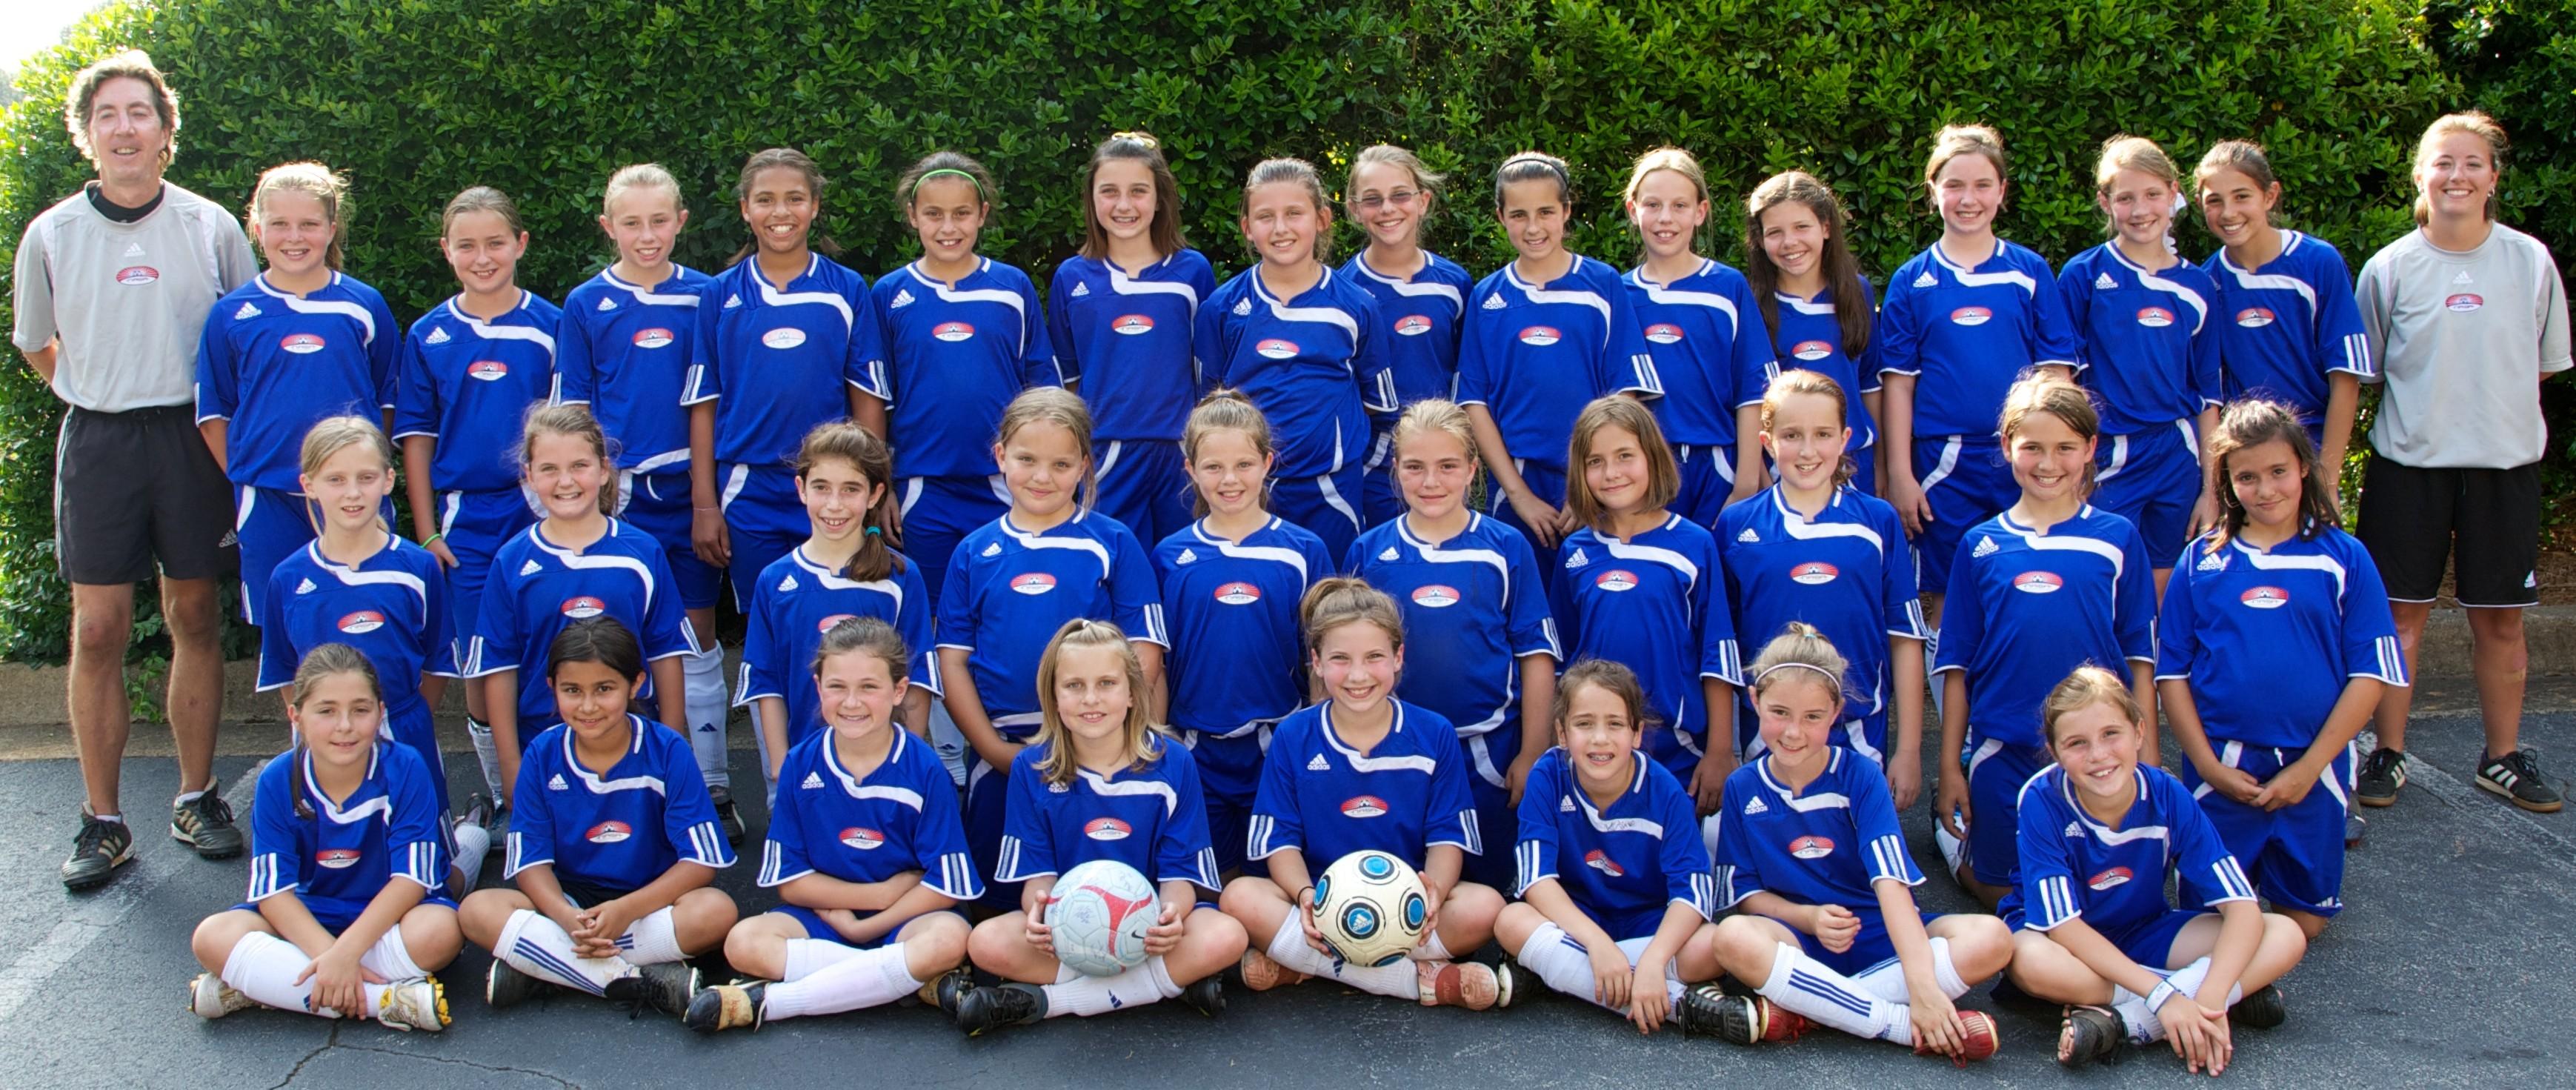 nasa soccer girls - photo #7